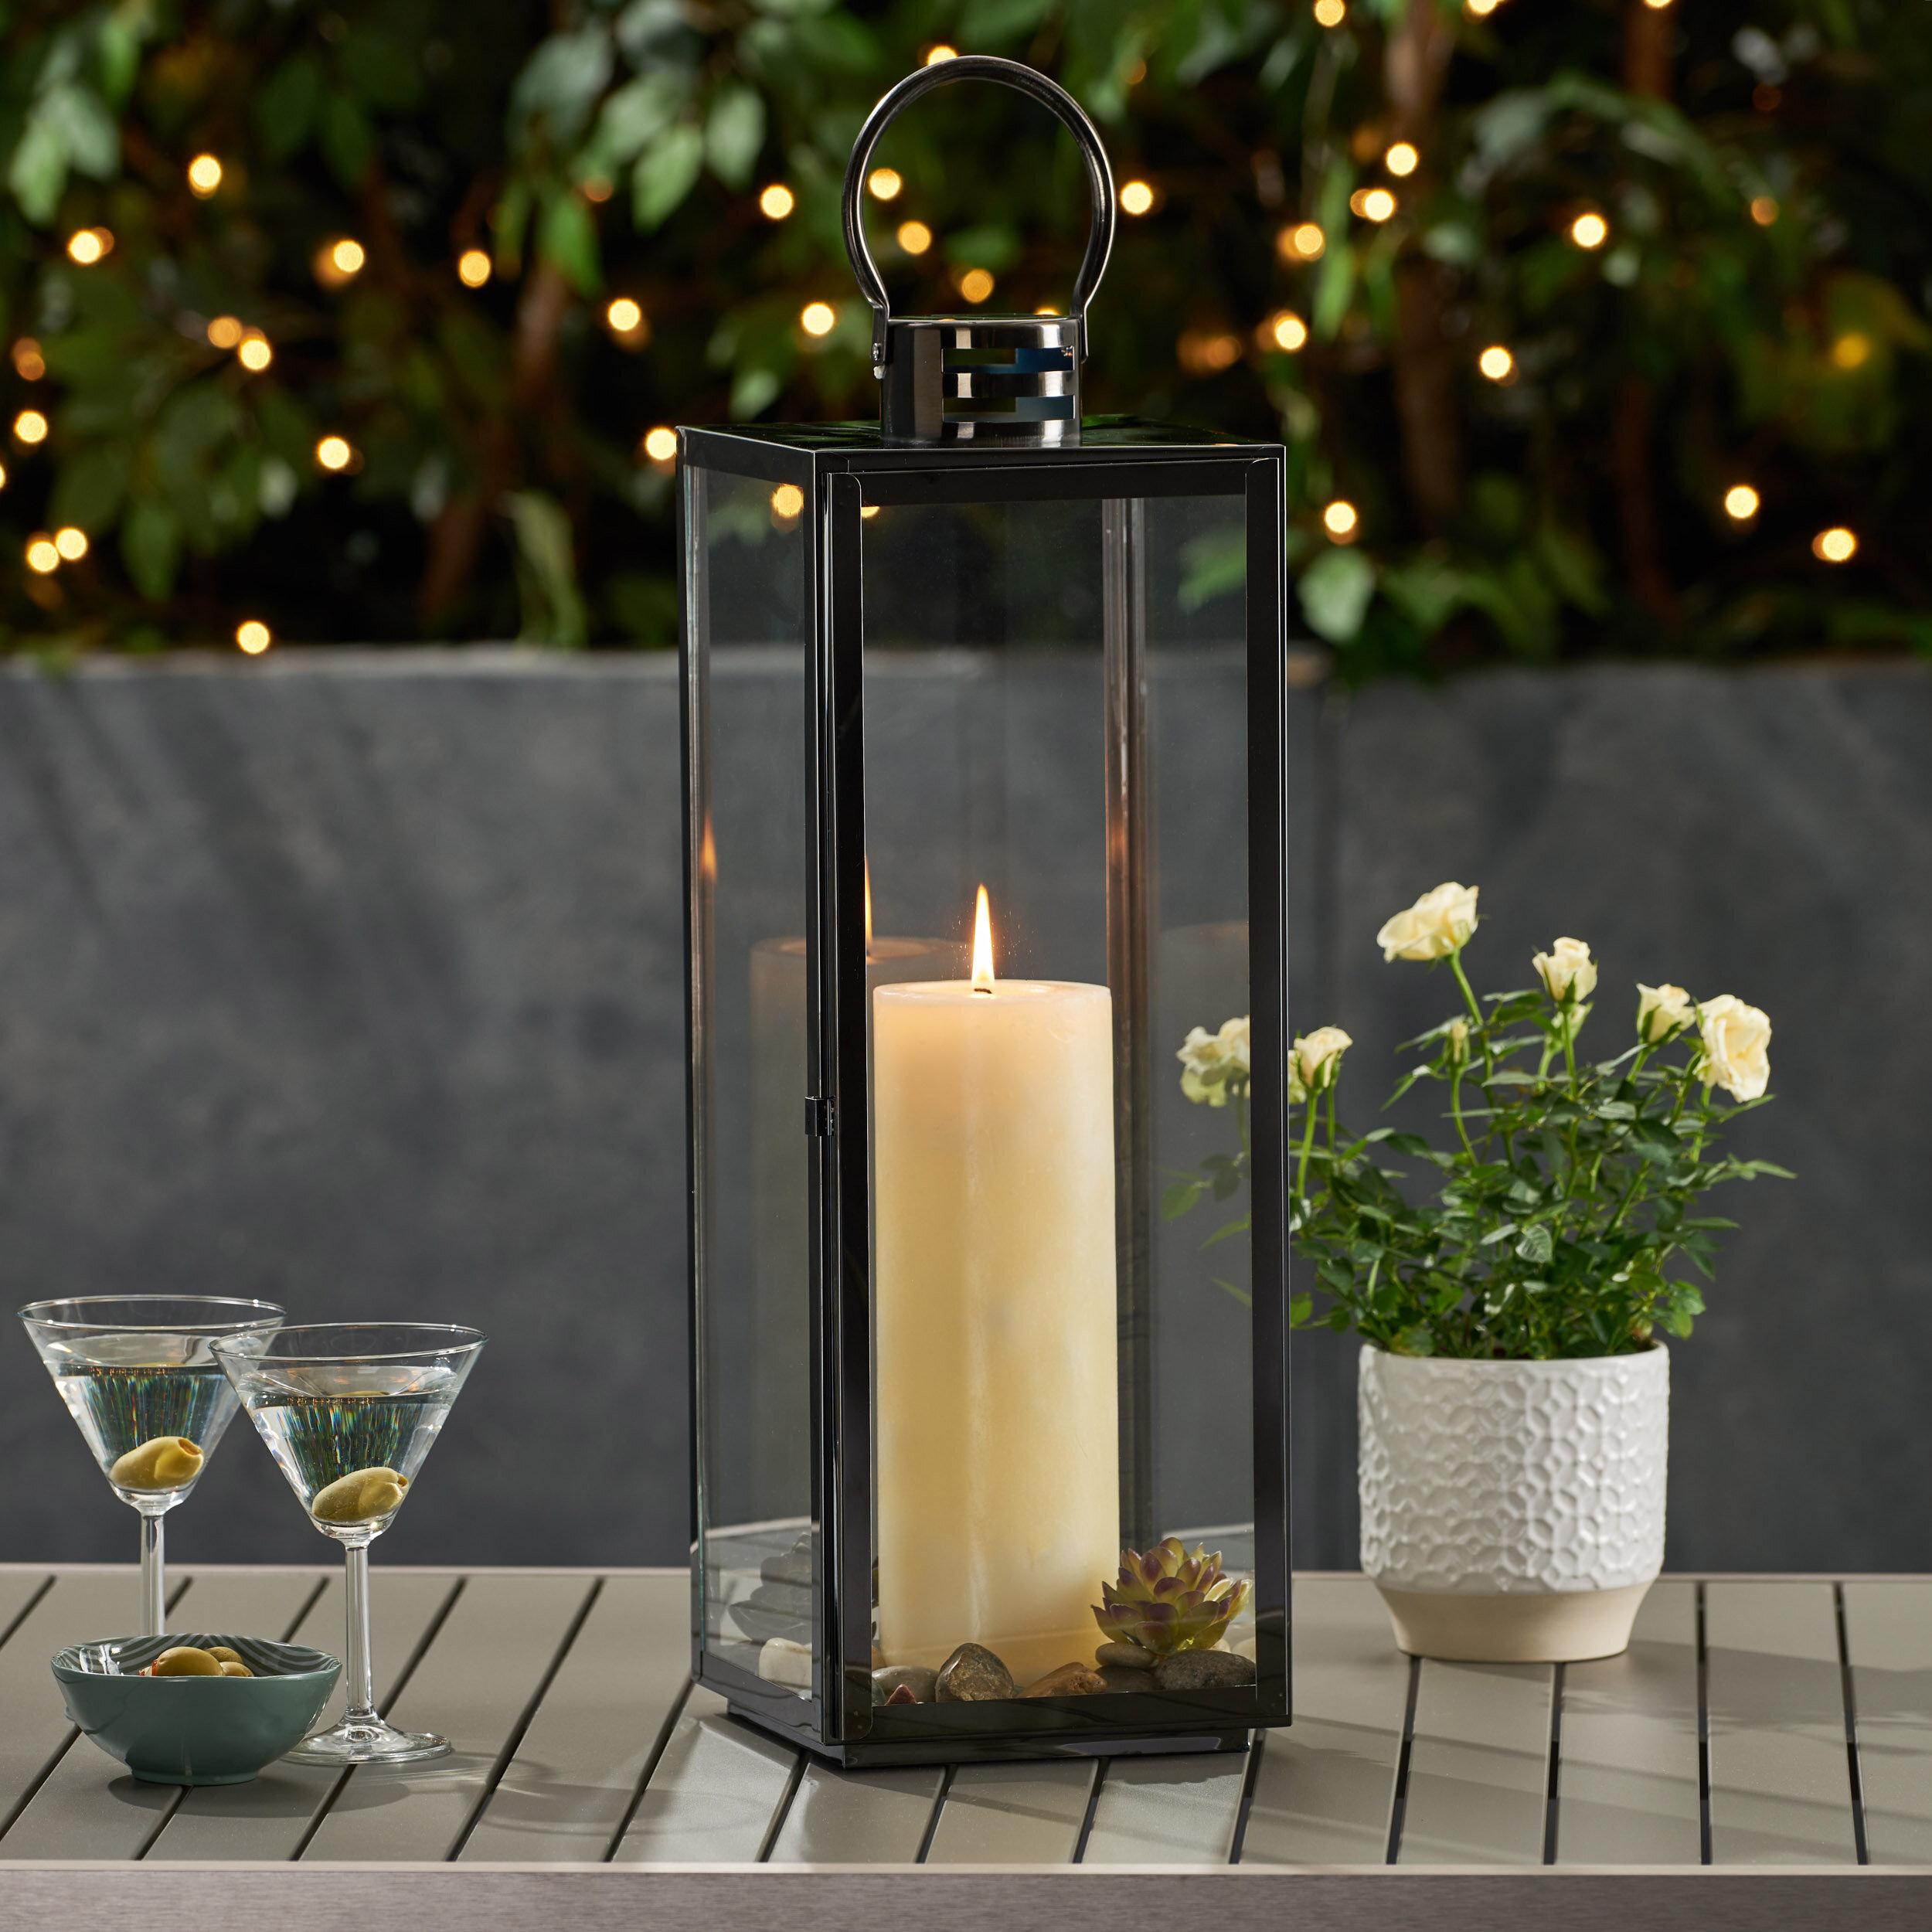 Brayden Studio Ashley Modern Stainless Steel Outdoor Lantern Reviews Wayfair